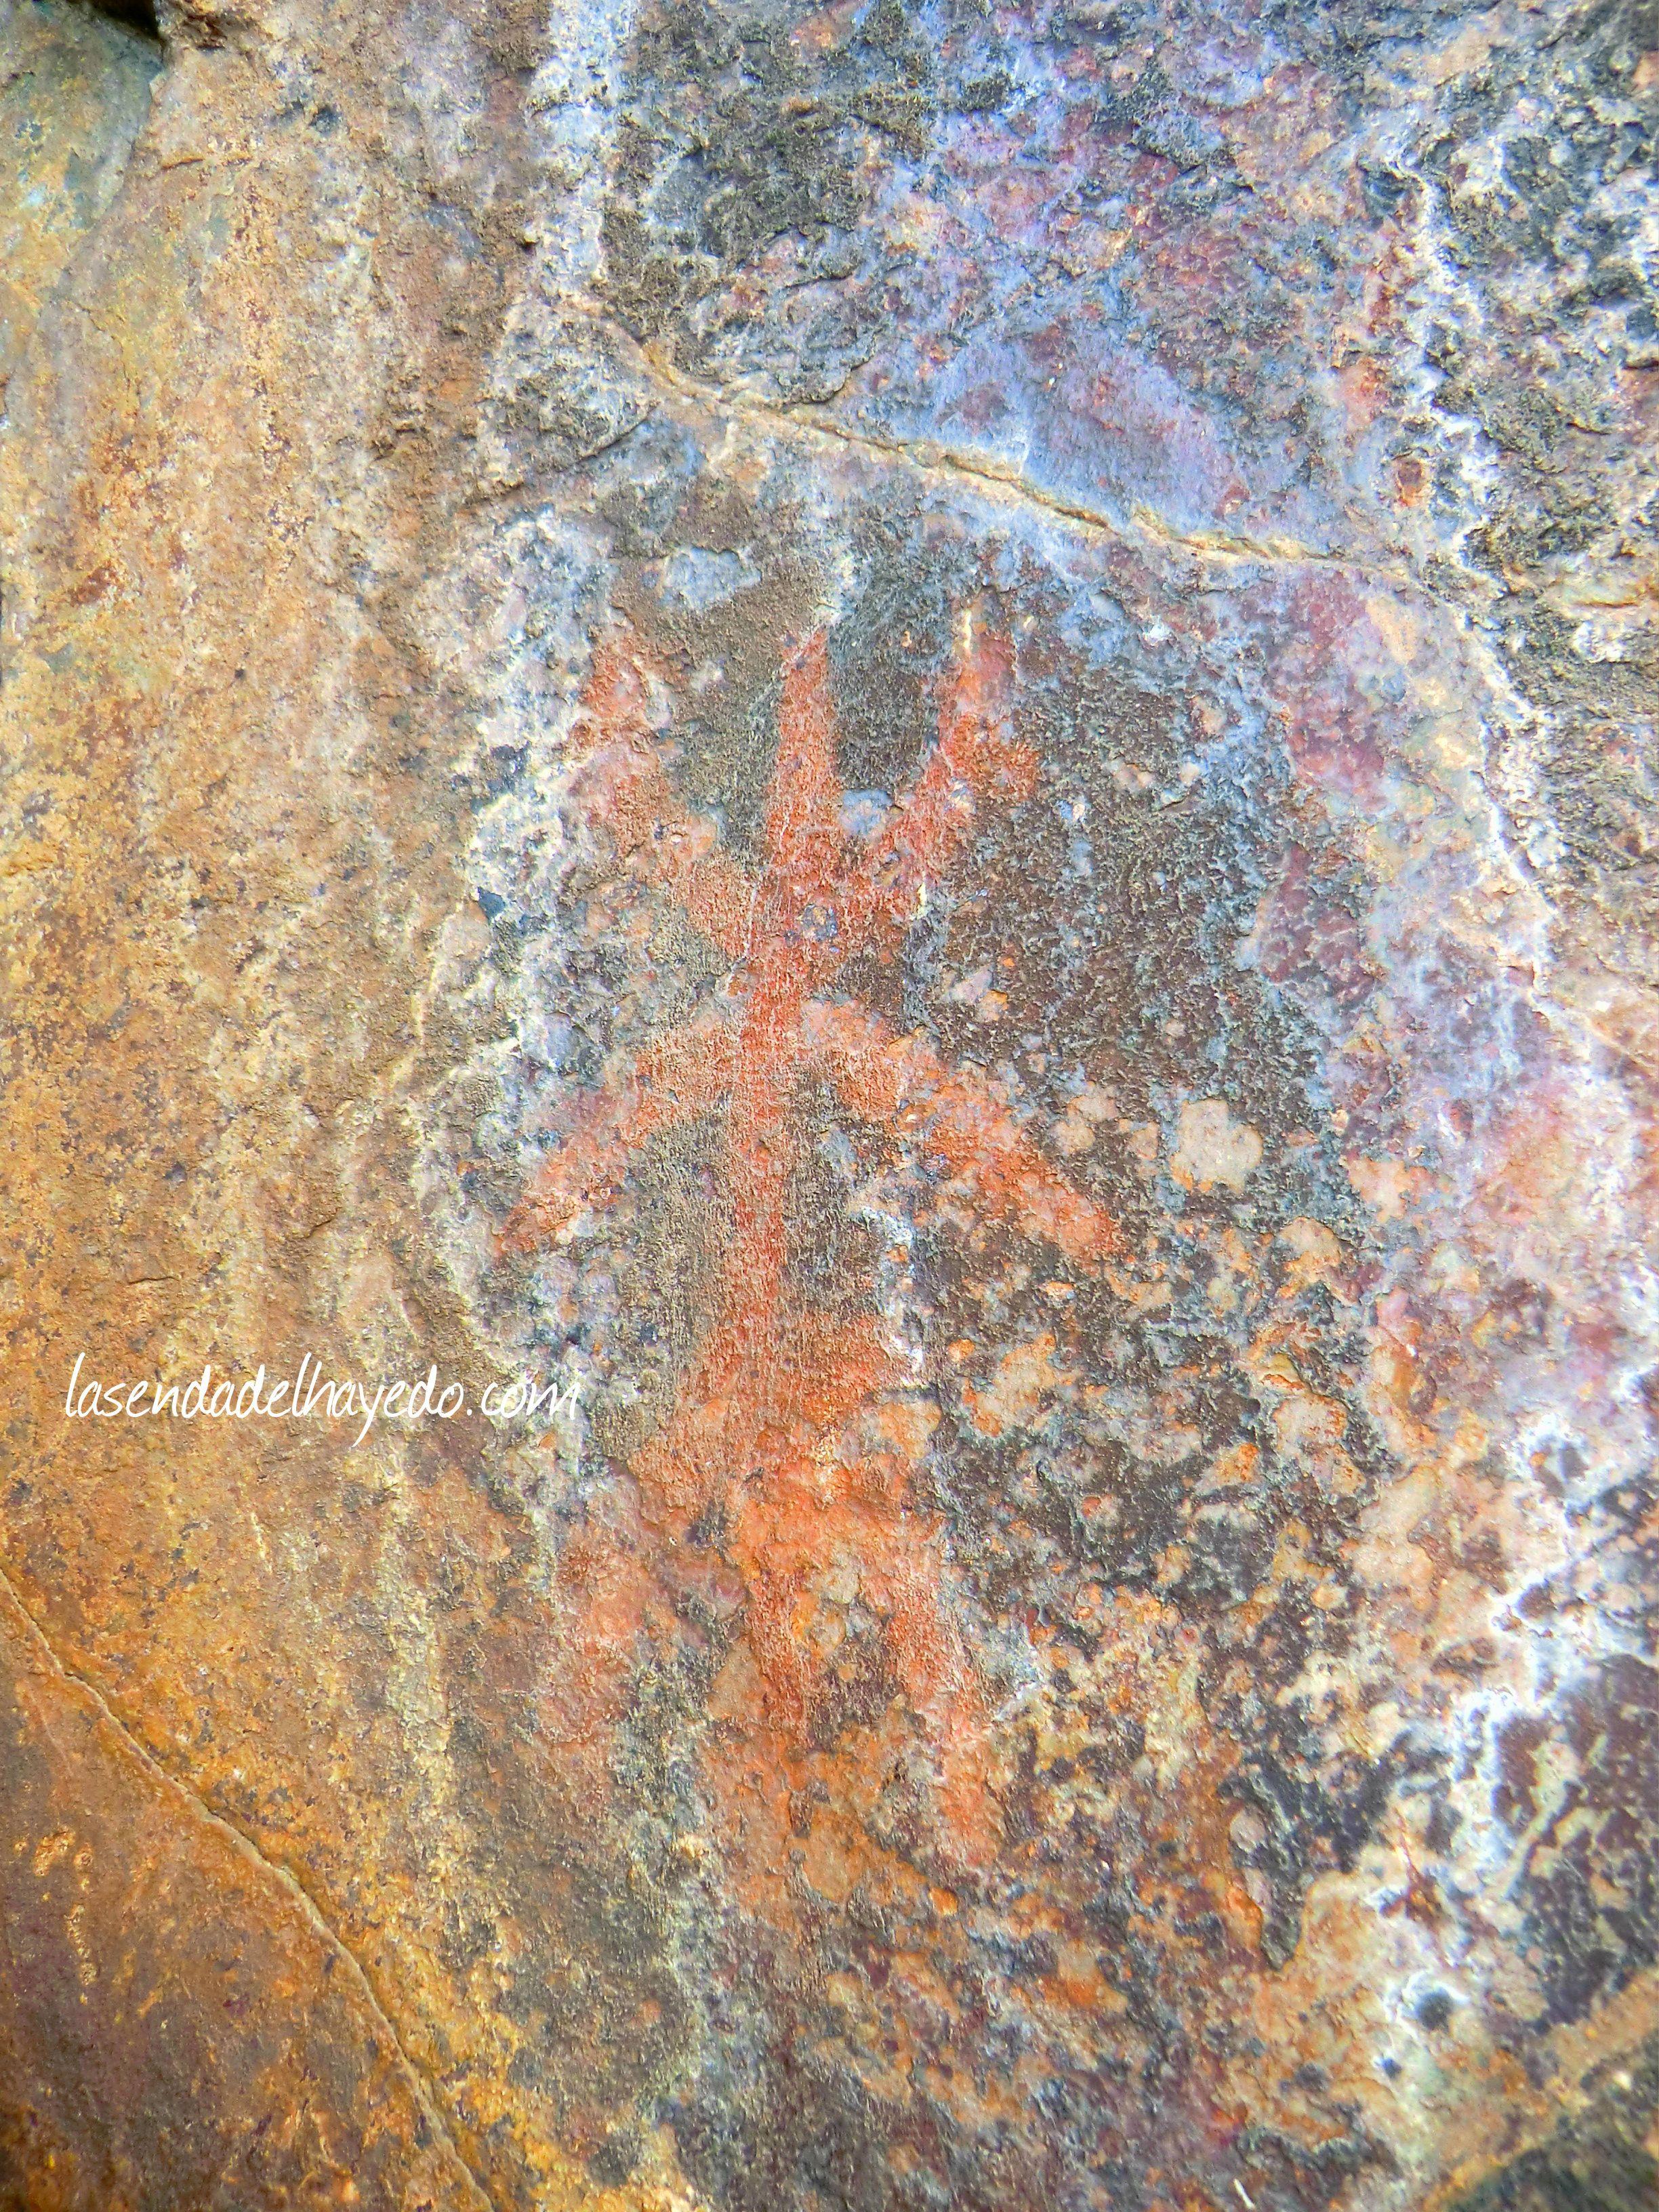 Figura humanoide llamativa de San Pedro Mallo